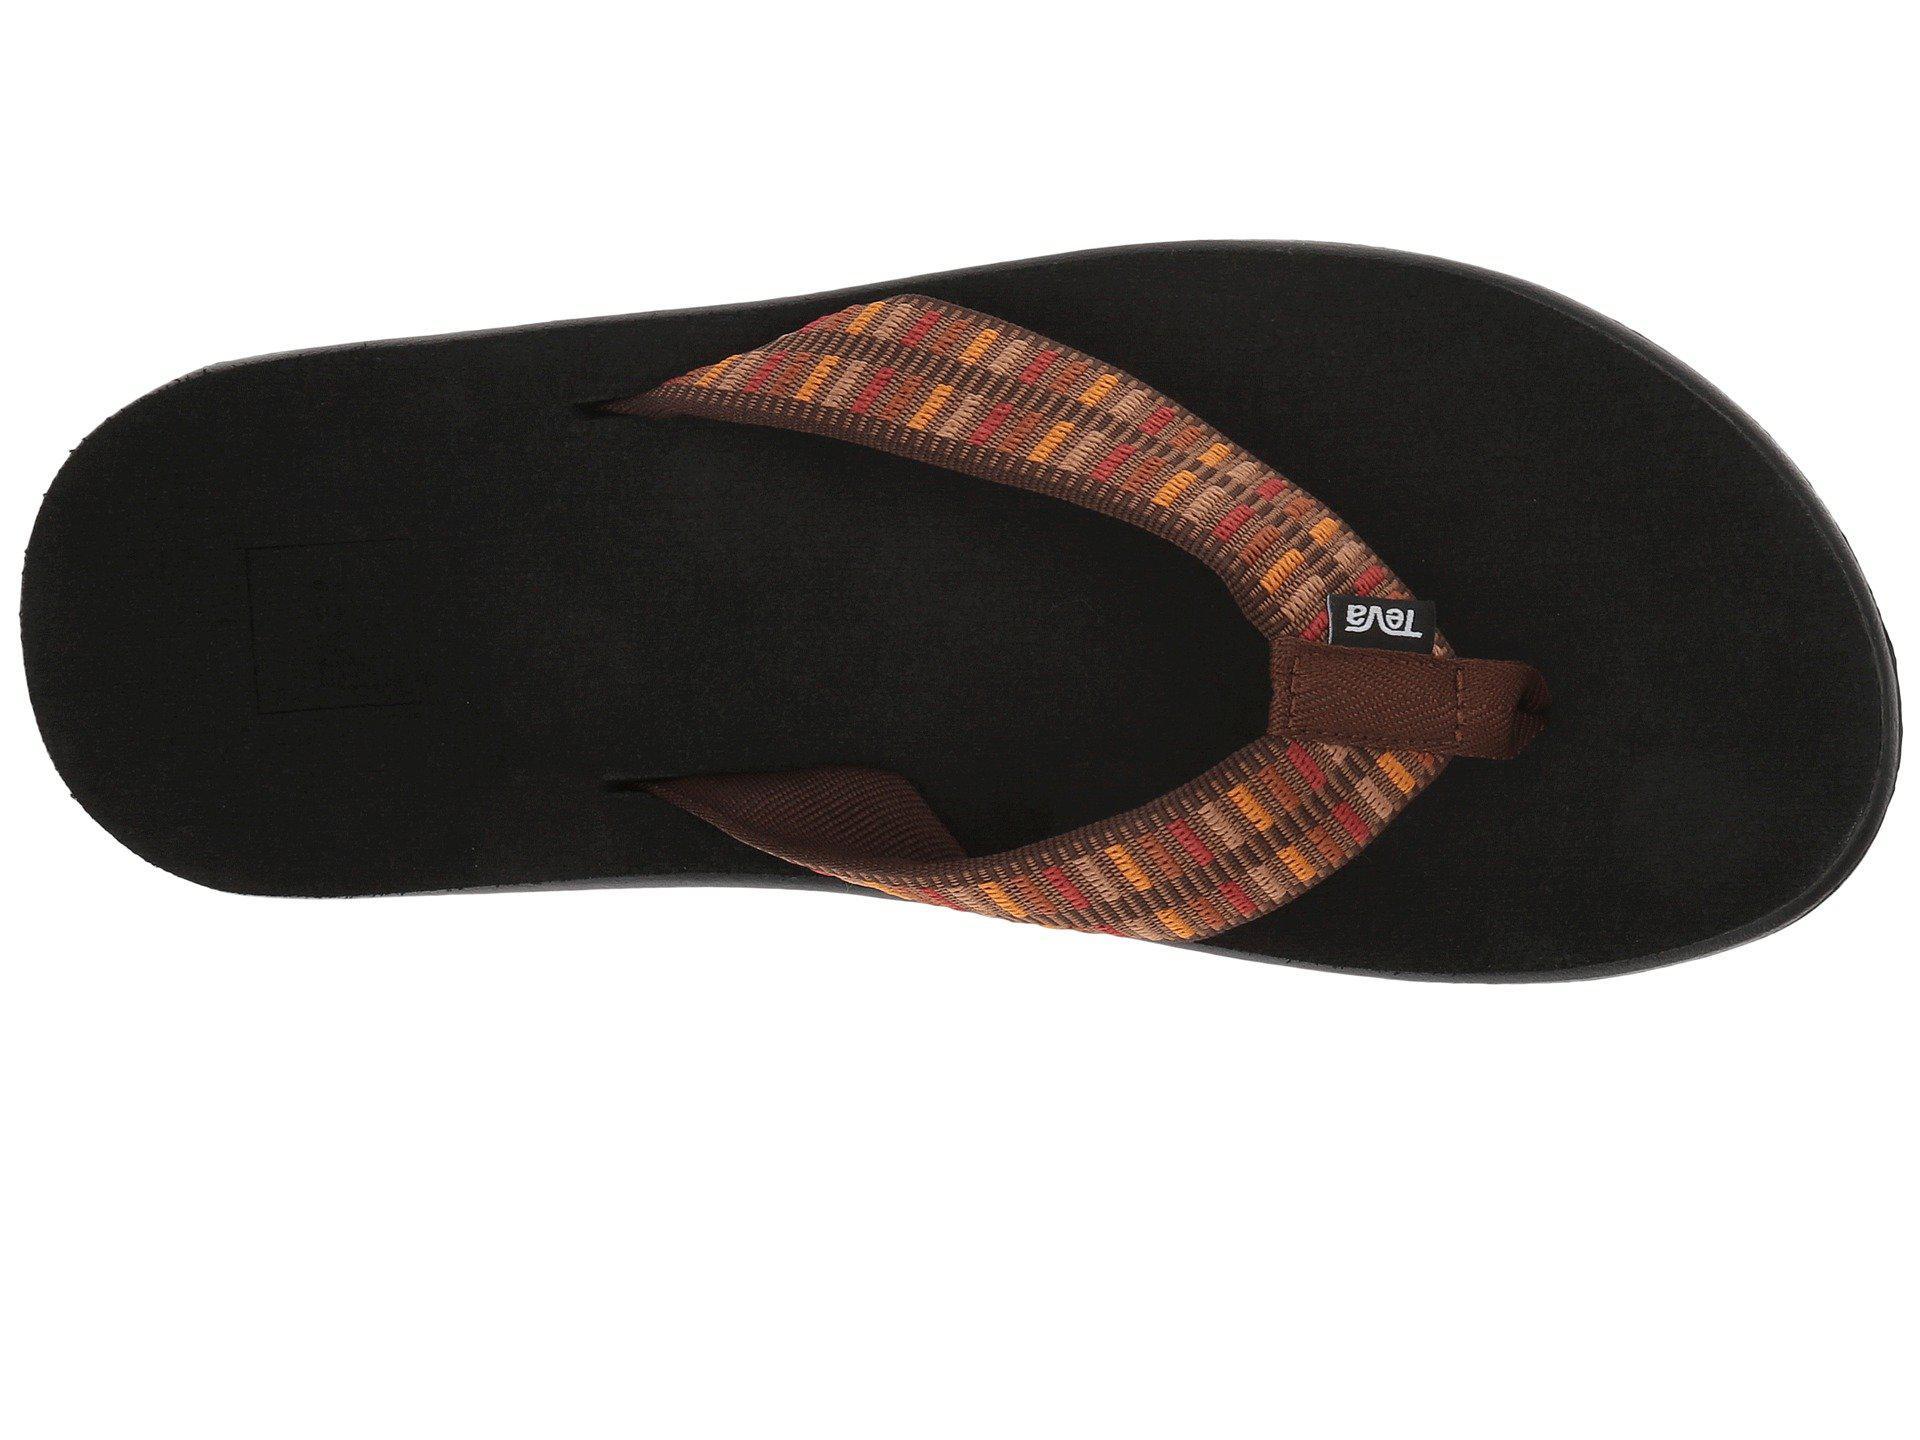 a574f5d35226 Teva - Multicolor Voya Flip (zook Black) Men s Sandals for Men - Lyst. View  fullscreen